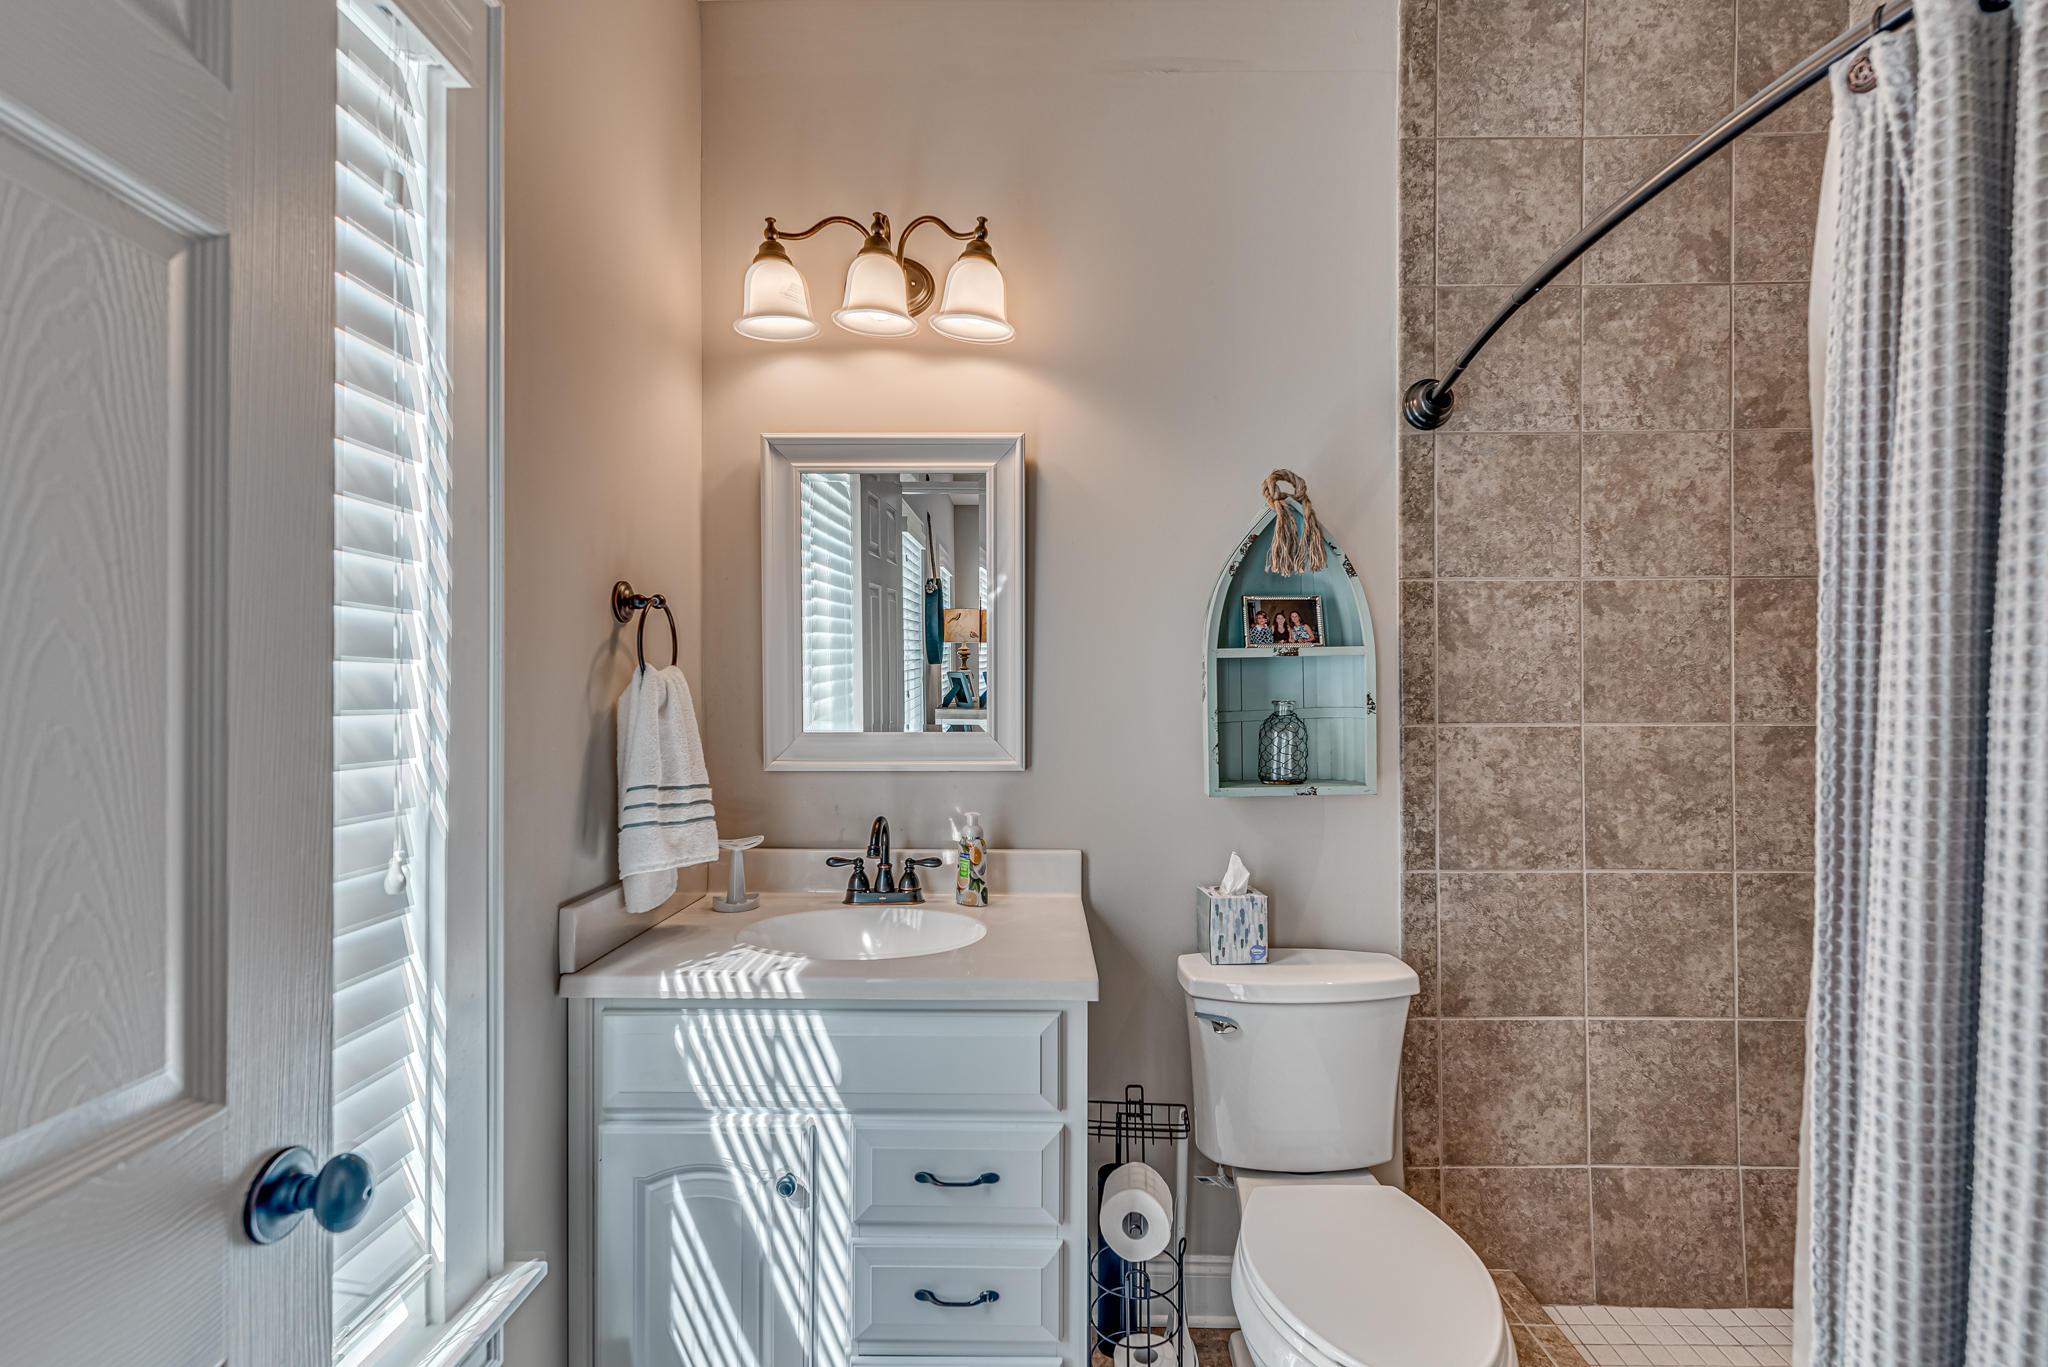 Daniel Island Smythe Park Homes For Sale - 1410 Wando View, Charleston, SC - 30